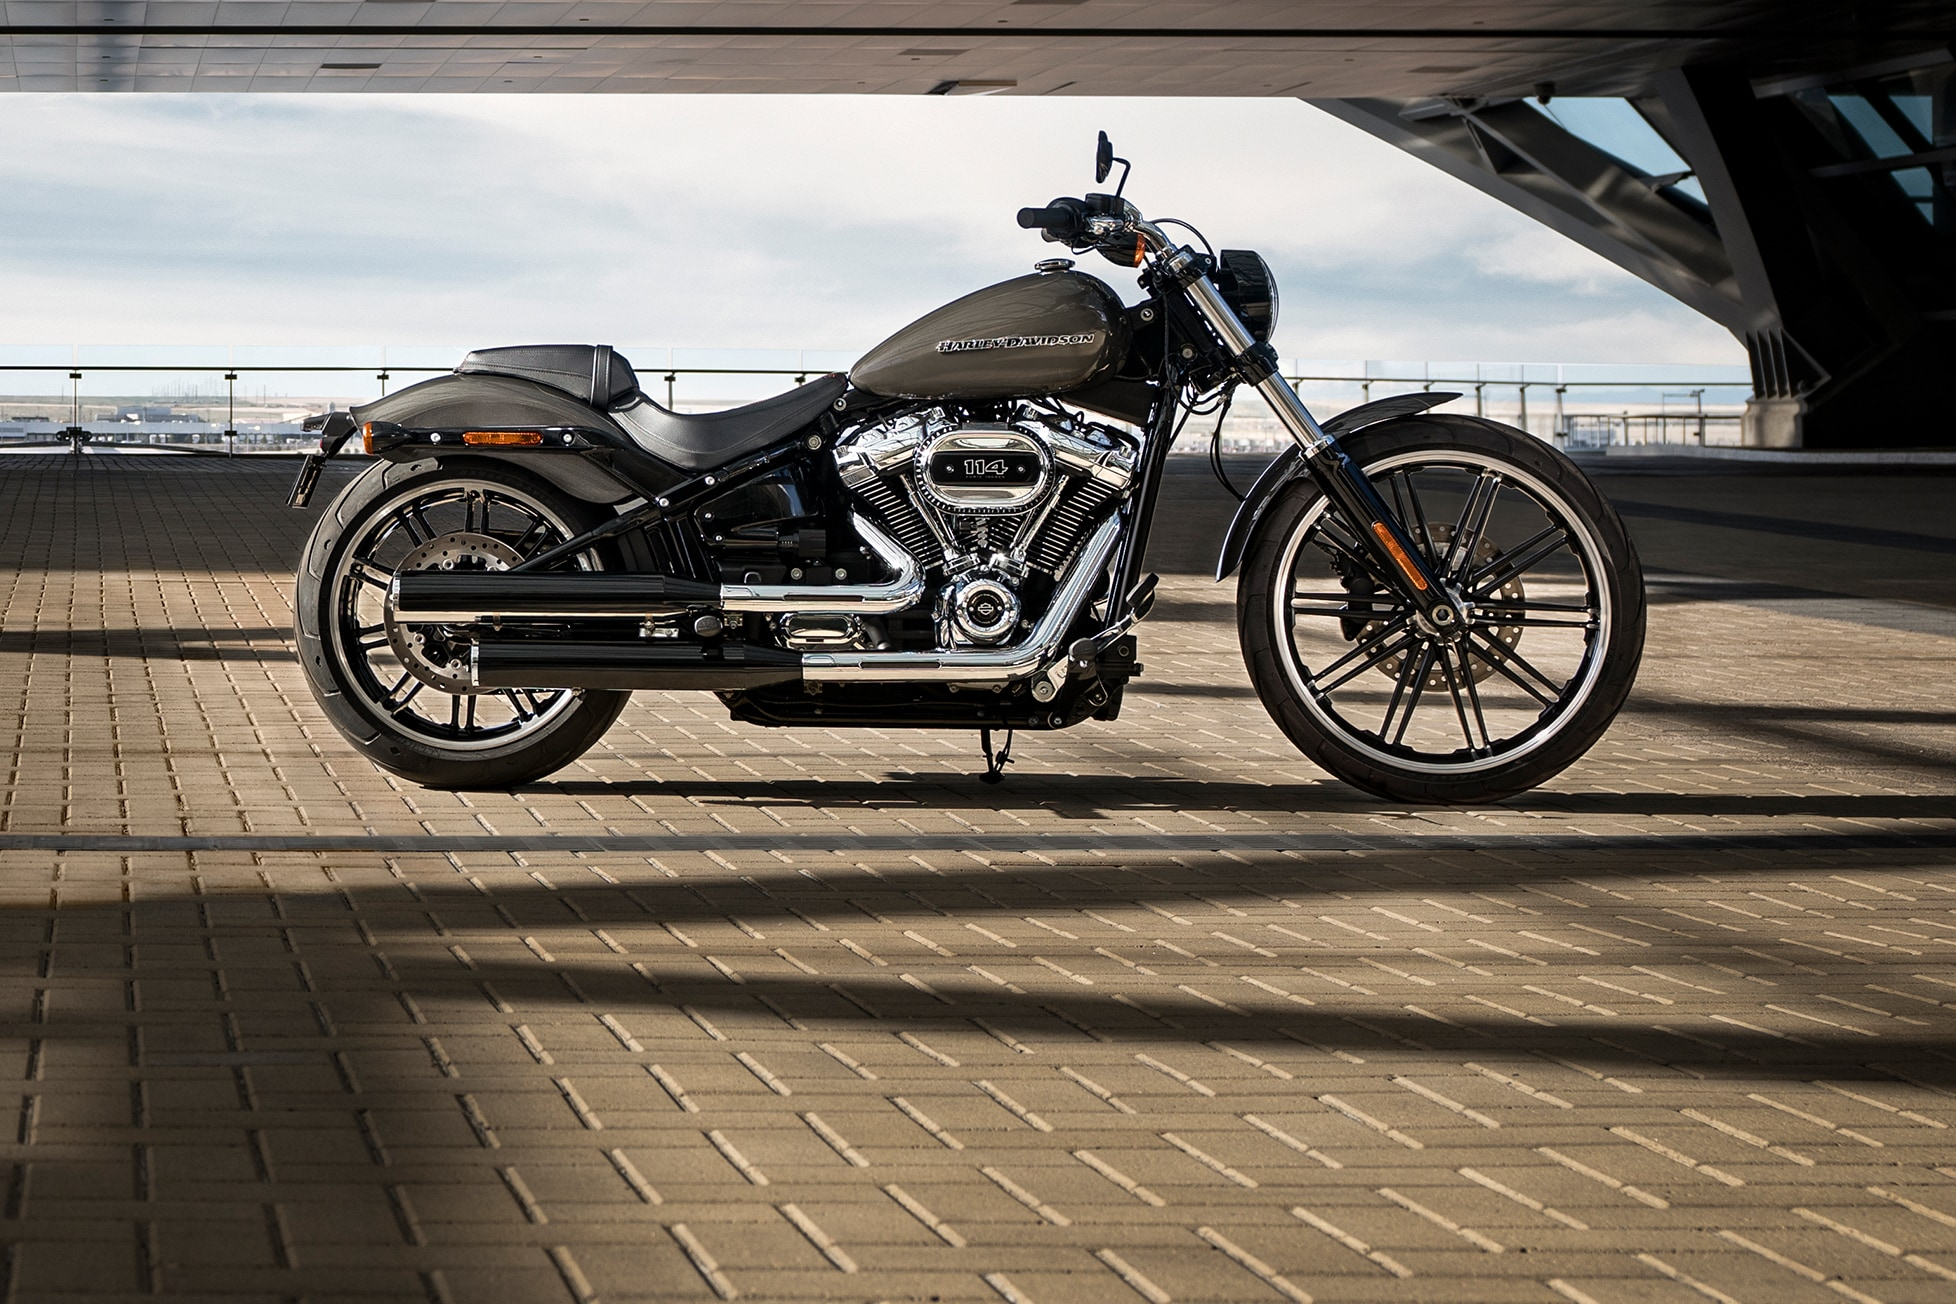 2019 breakout motorcycle harley davidson australia new zealand. Black Bedroom Furniture Sets. Home Design Ideas